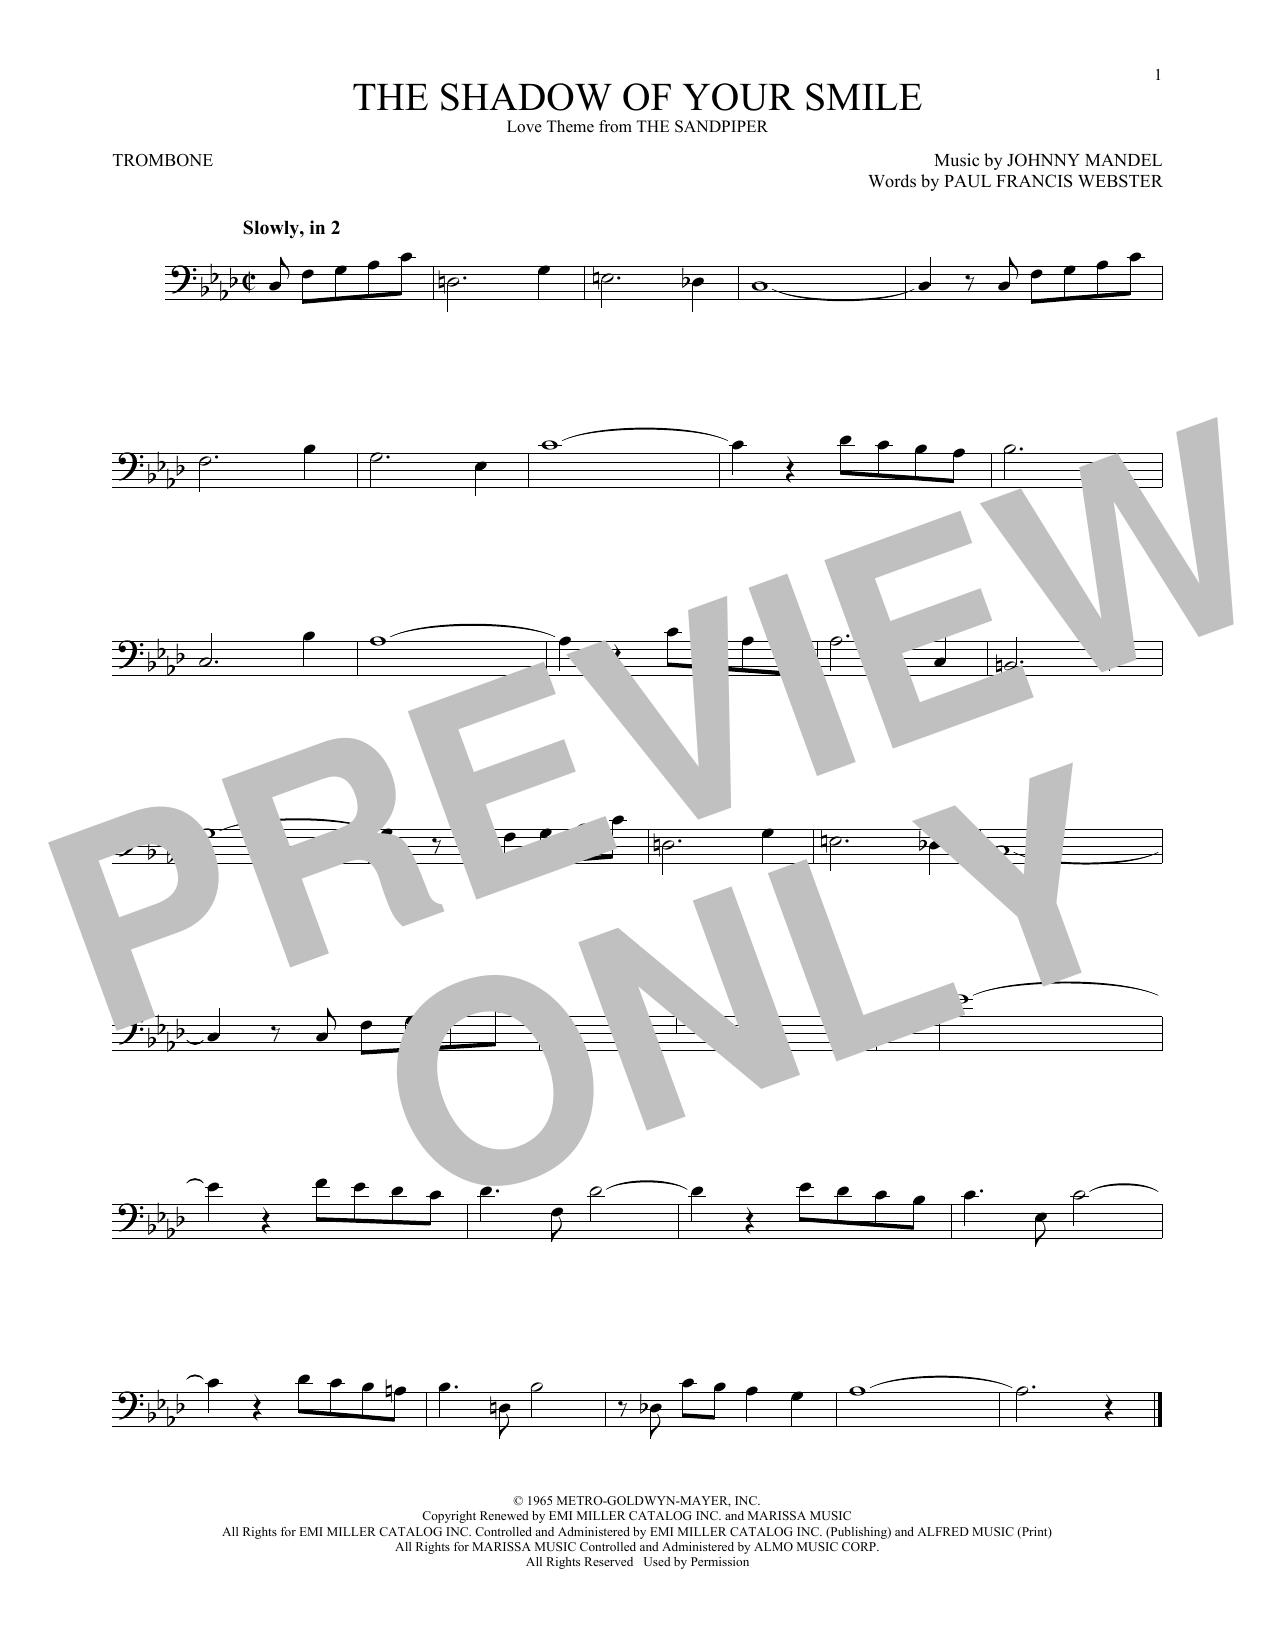 Sheet Music Digital Files To Print Licensed Johnny Mandel Digital